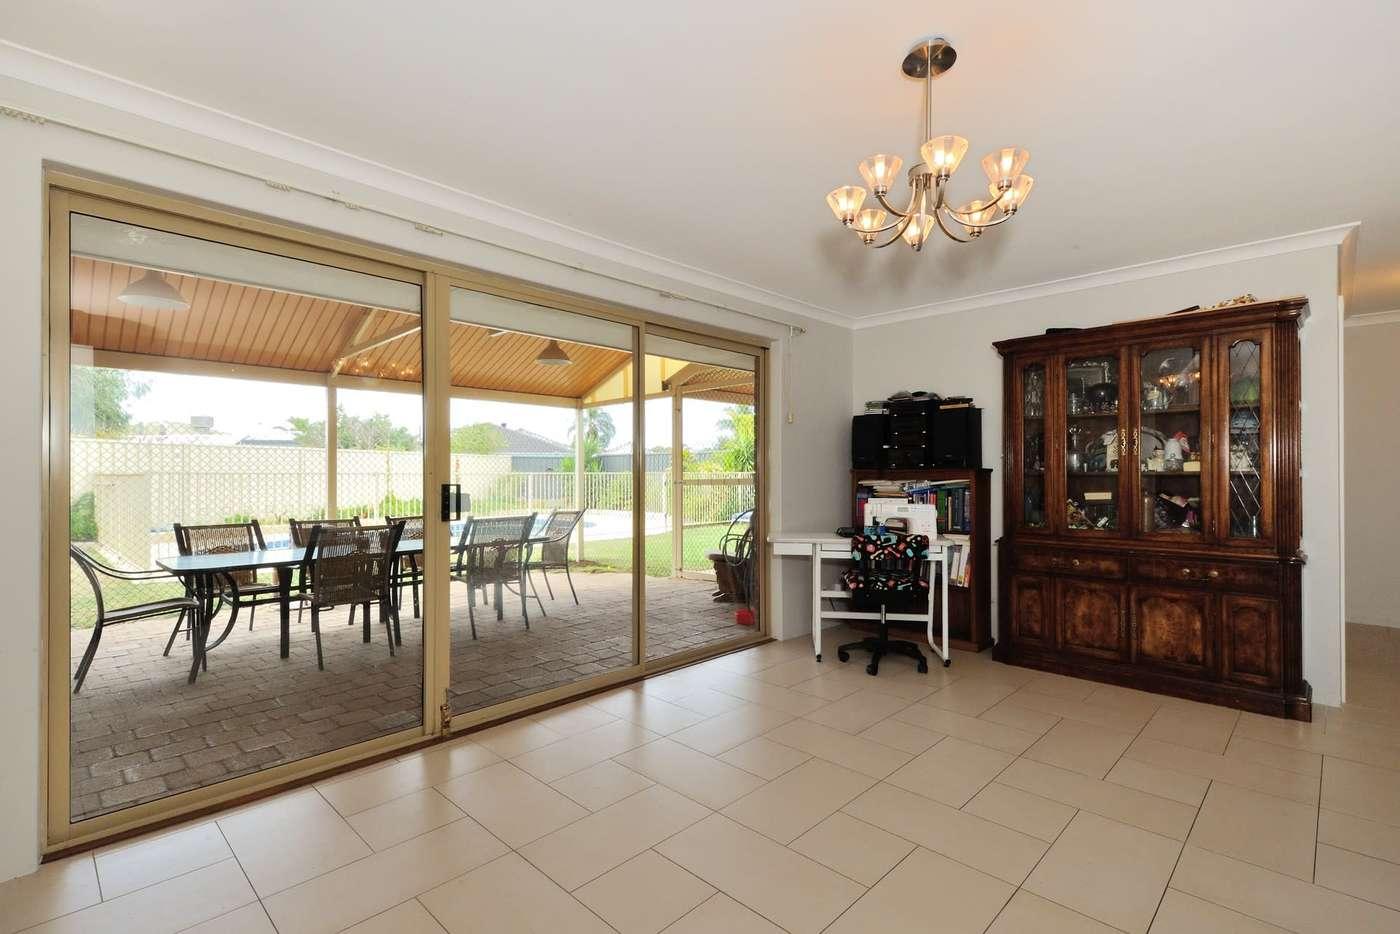 Seventh view of Homely house listing, 9 Kybra Mews, Rockingham WA 6168